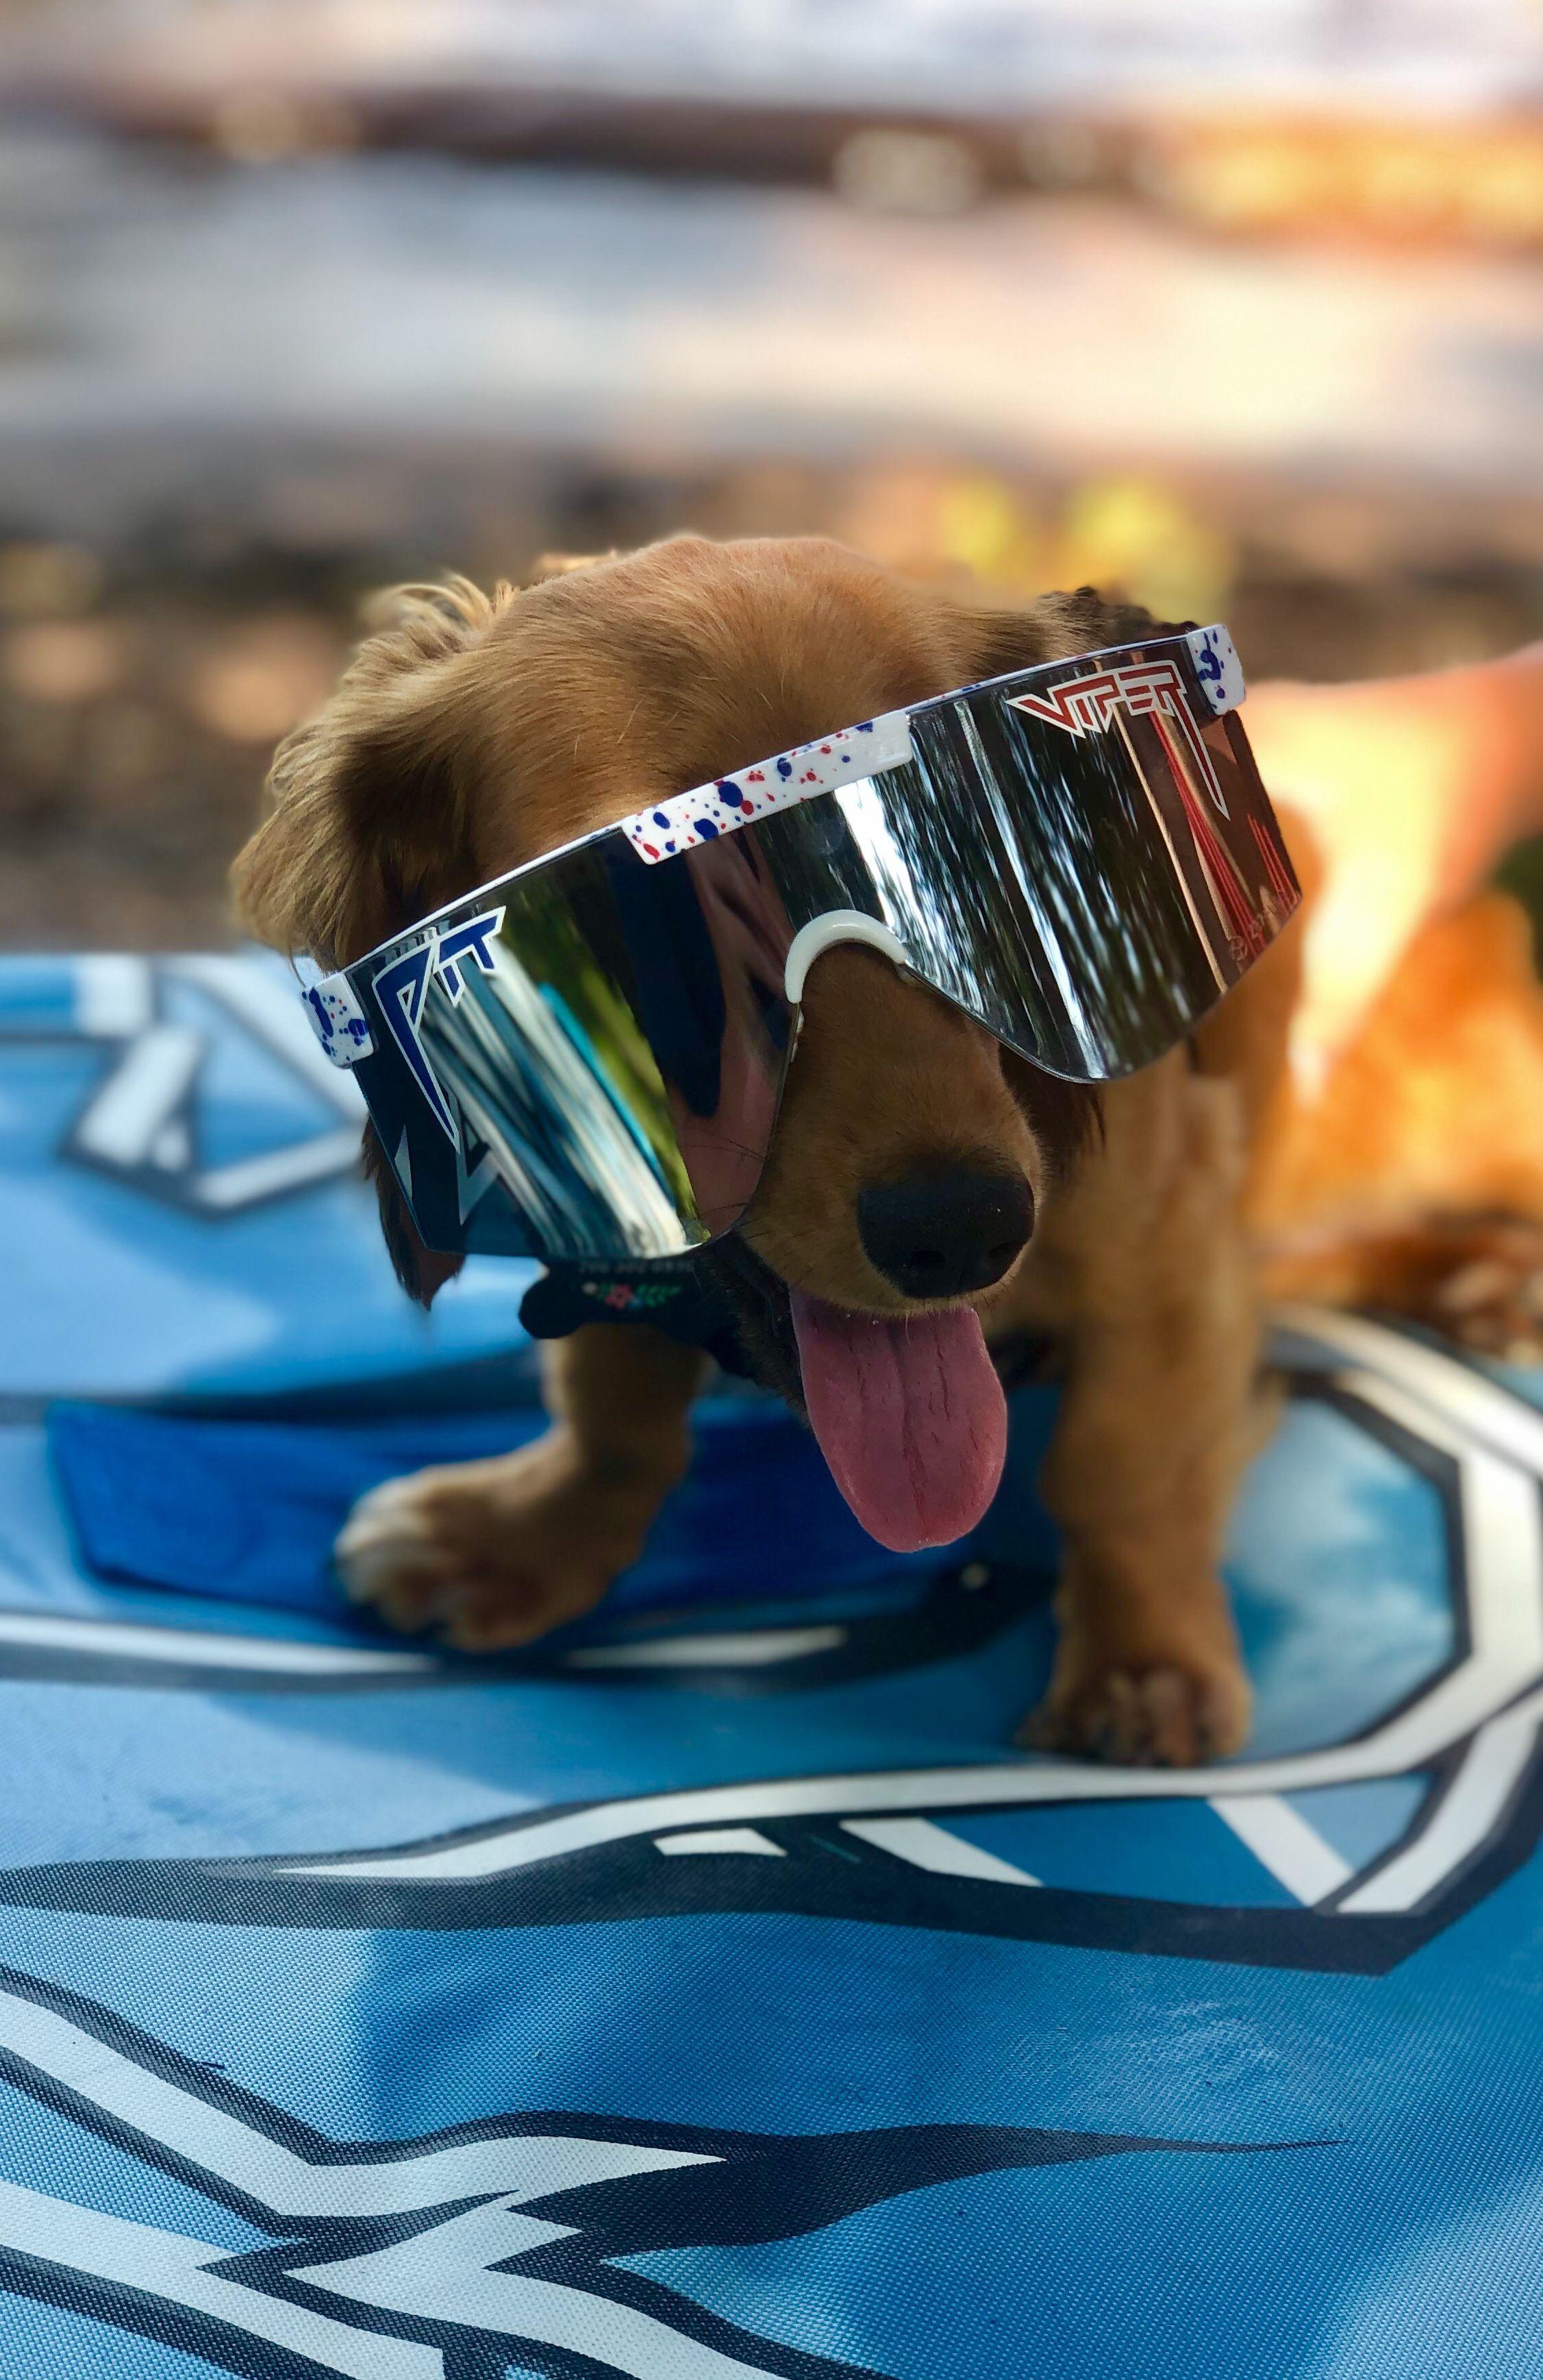 The Merika 2000 in 2020 Pit viper sunglasses, Pit viper